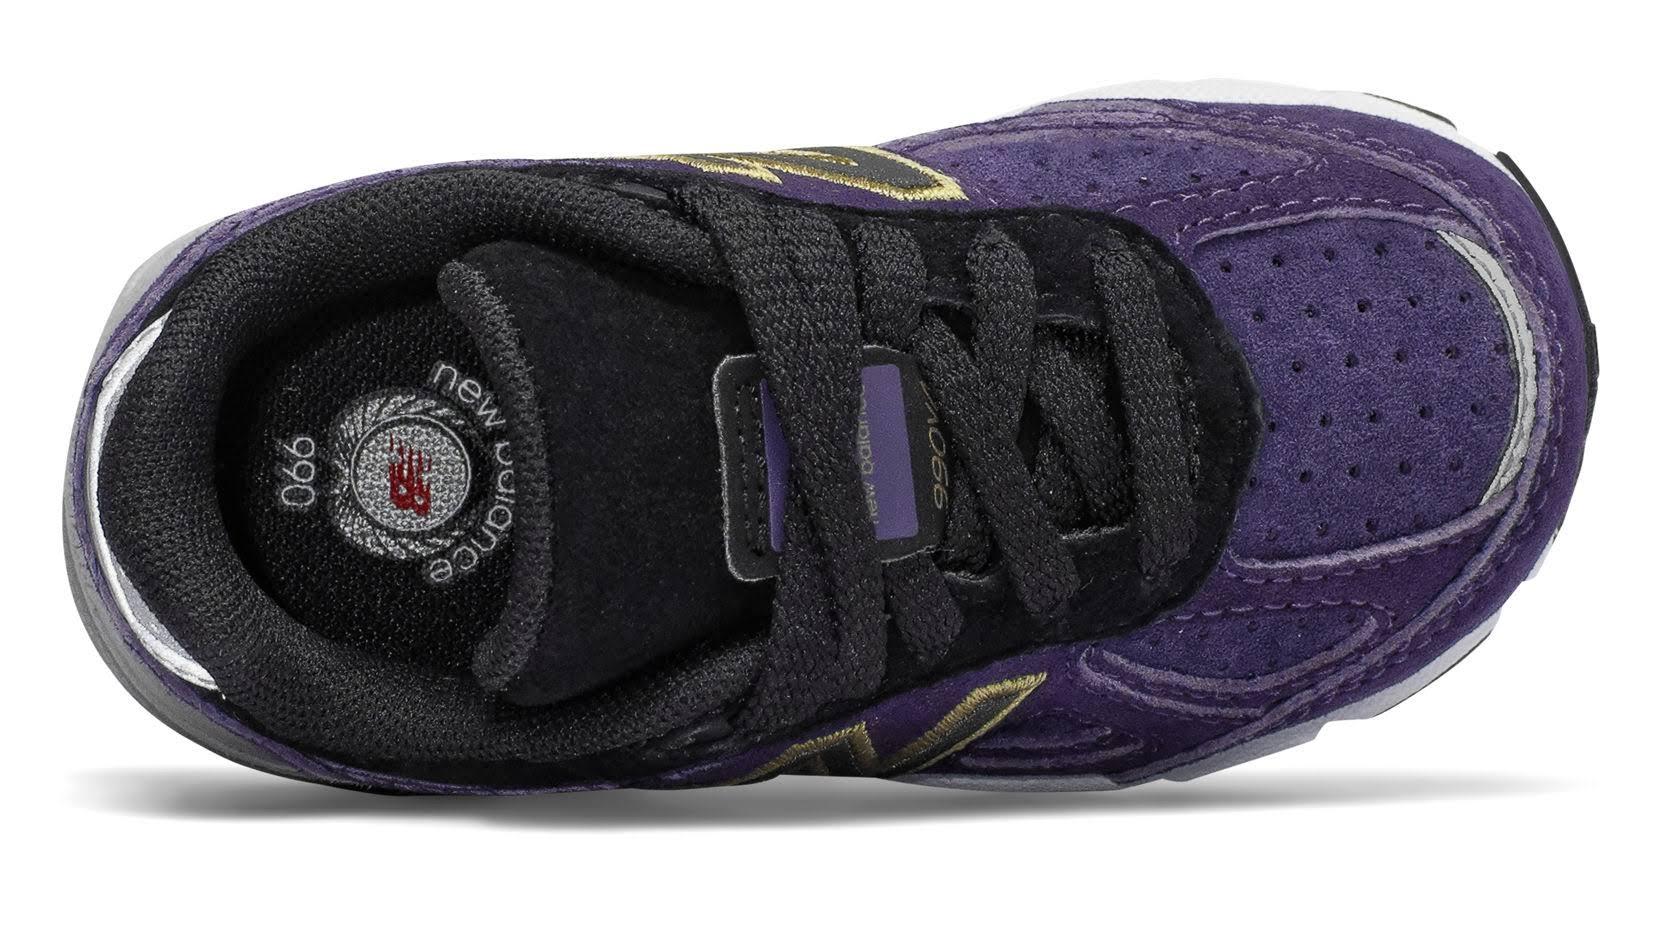 Indigo Para New Negro Balance Salvaje Zapatos 990 4 Tamaño Kj990b4i001 Pequeñas Niñas UPCqp